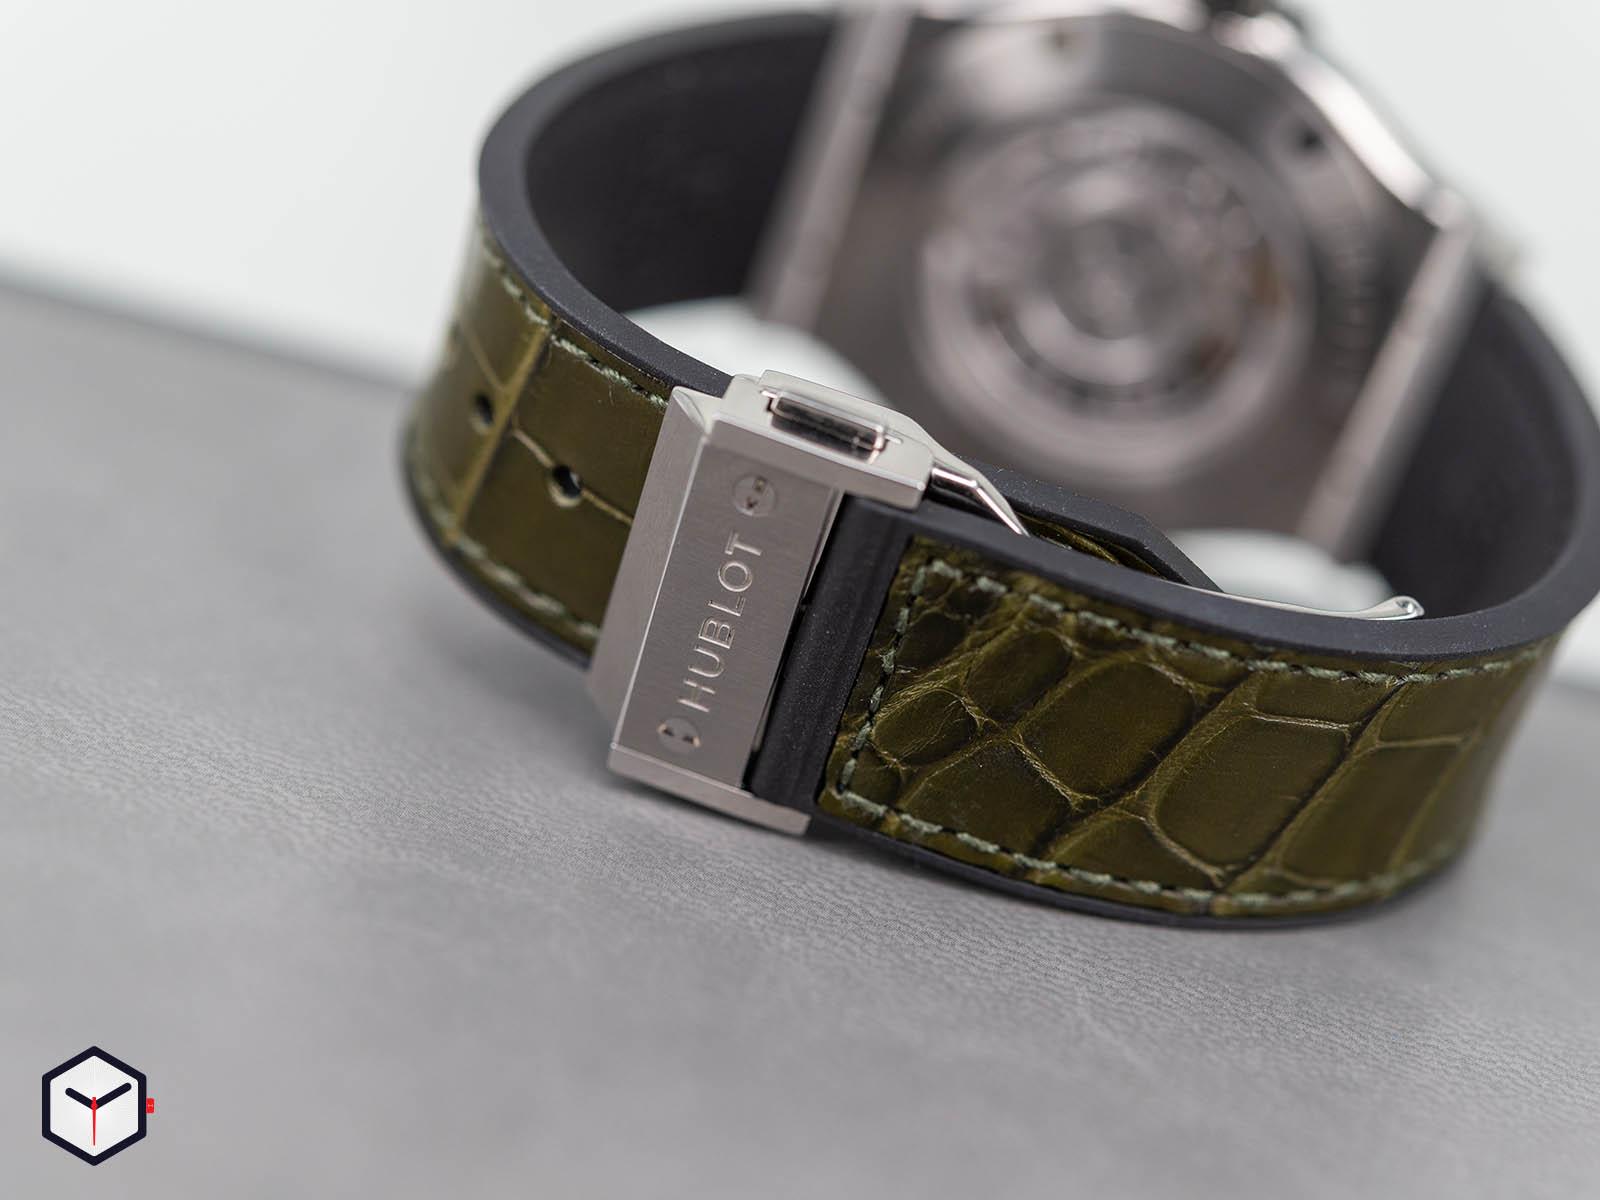 565-nx-8970-lr-hublot-classic-fusion-green-titanium-38mm-6.jpg